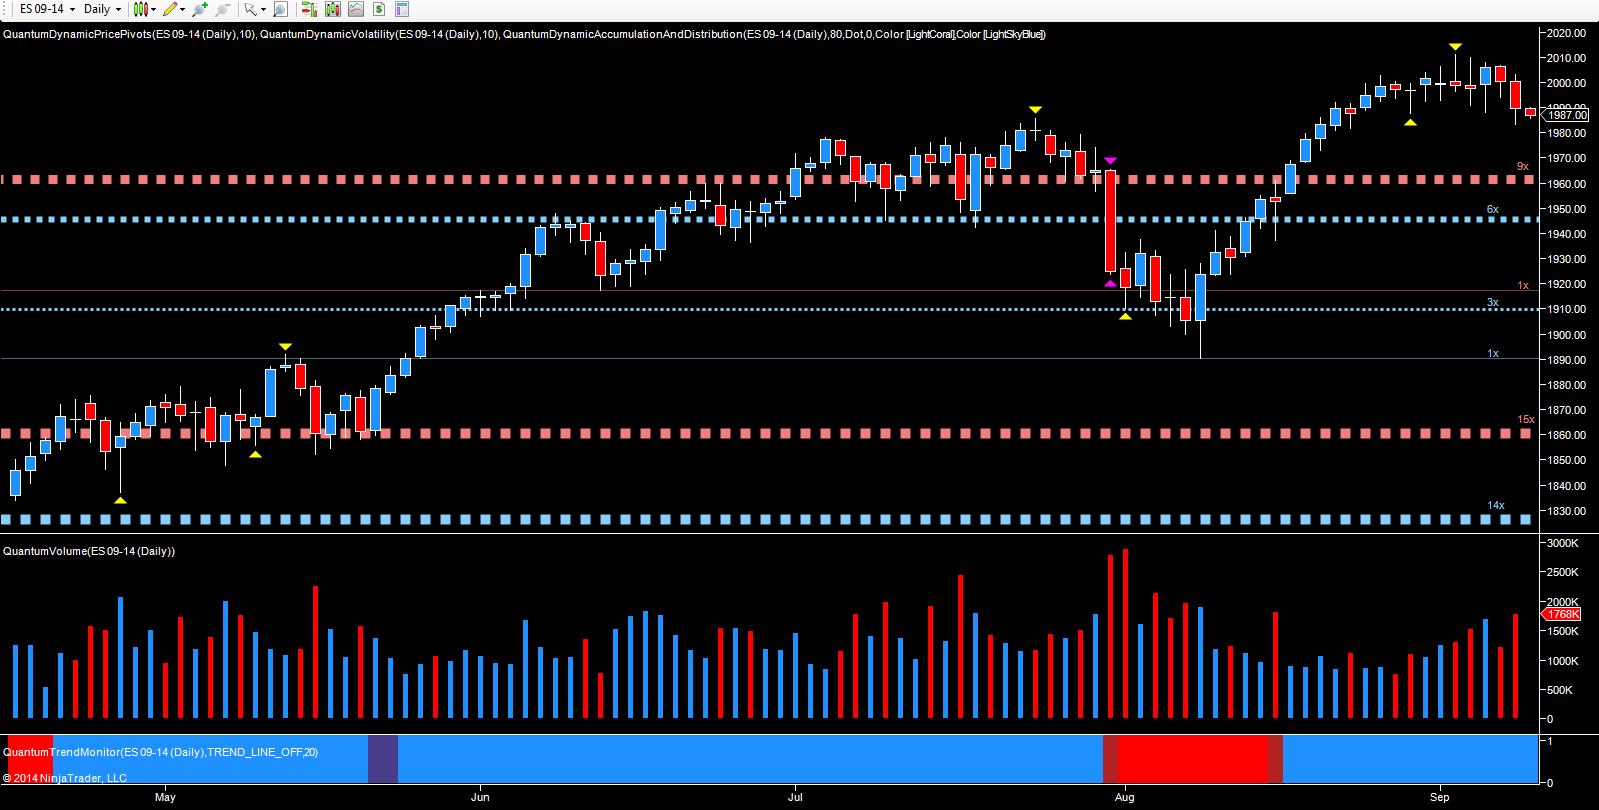 ES Emini - daily chart